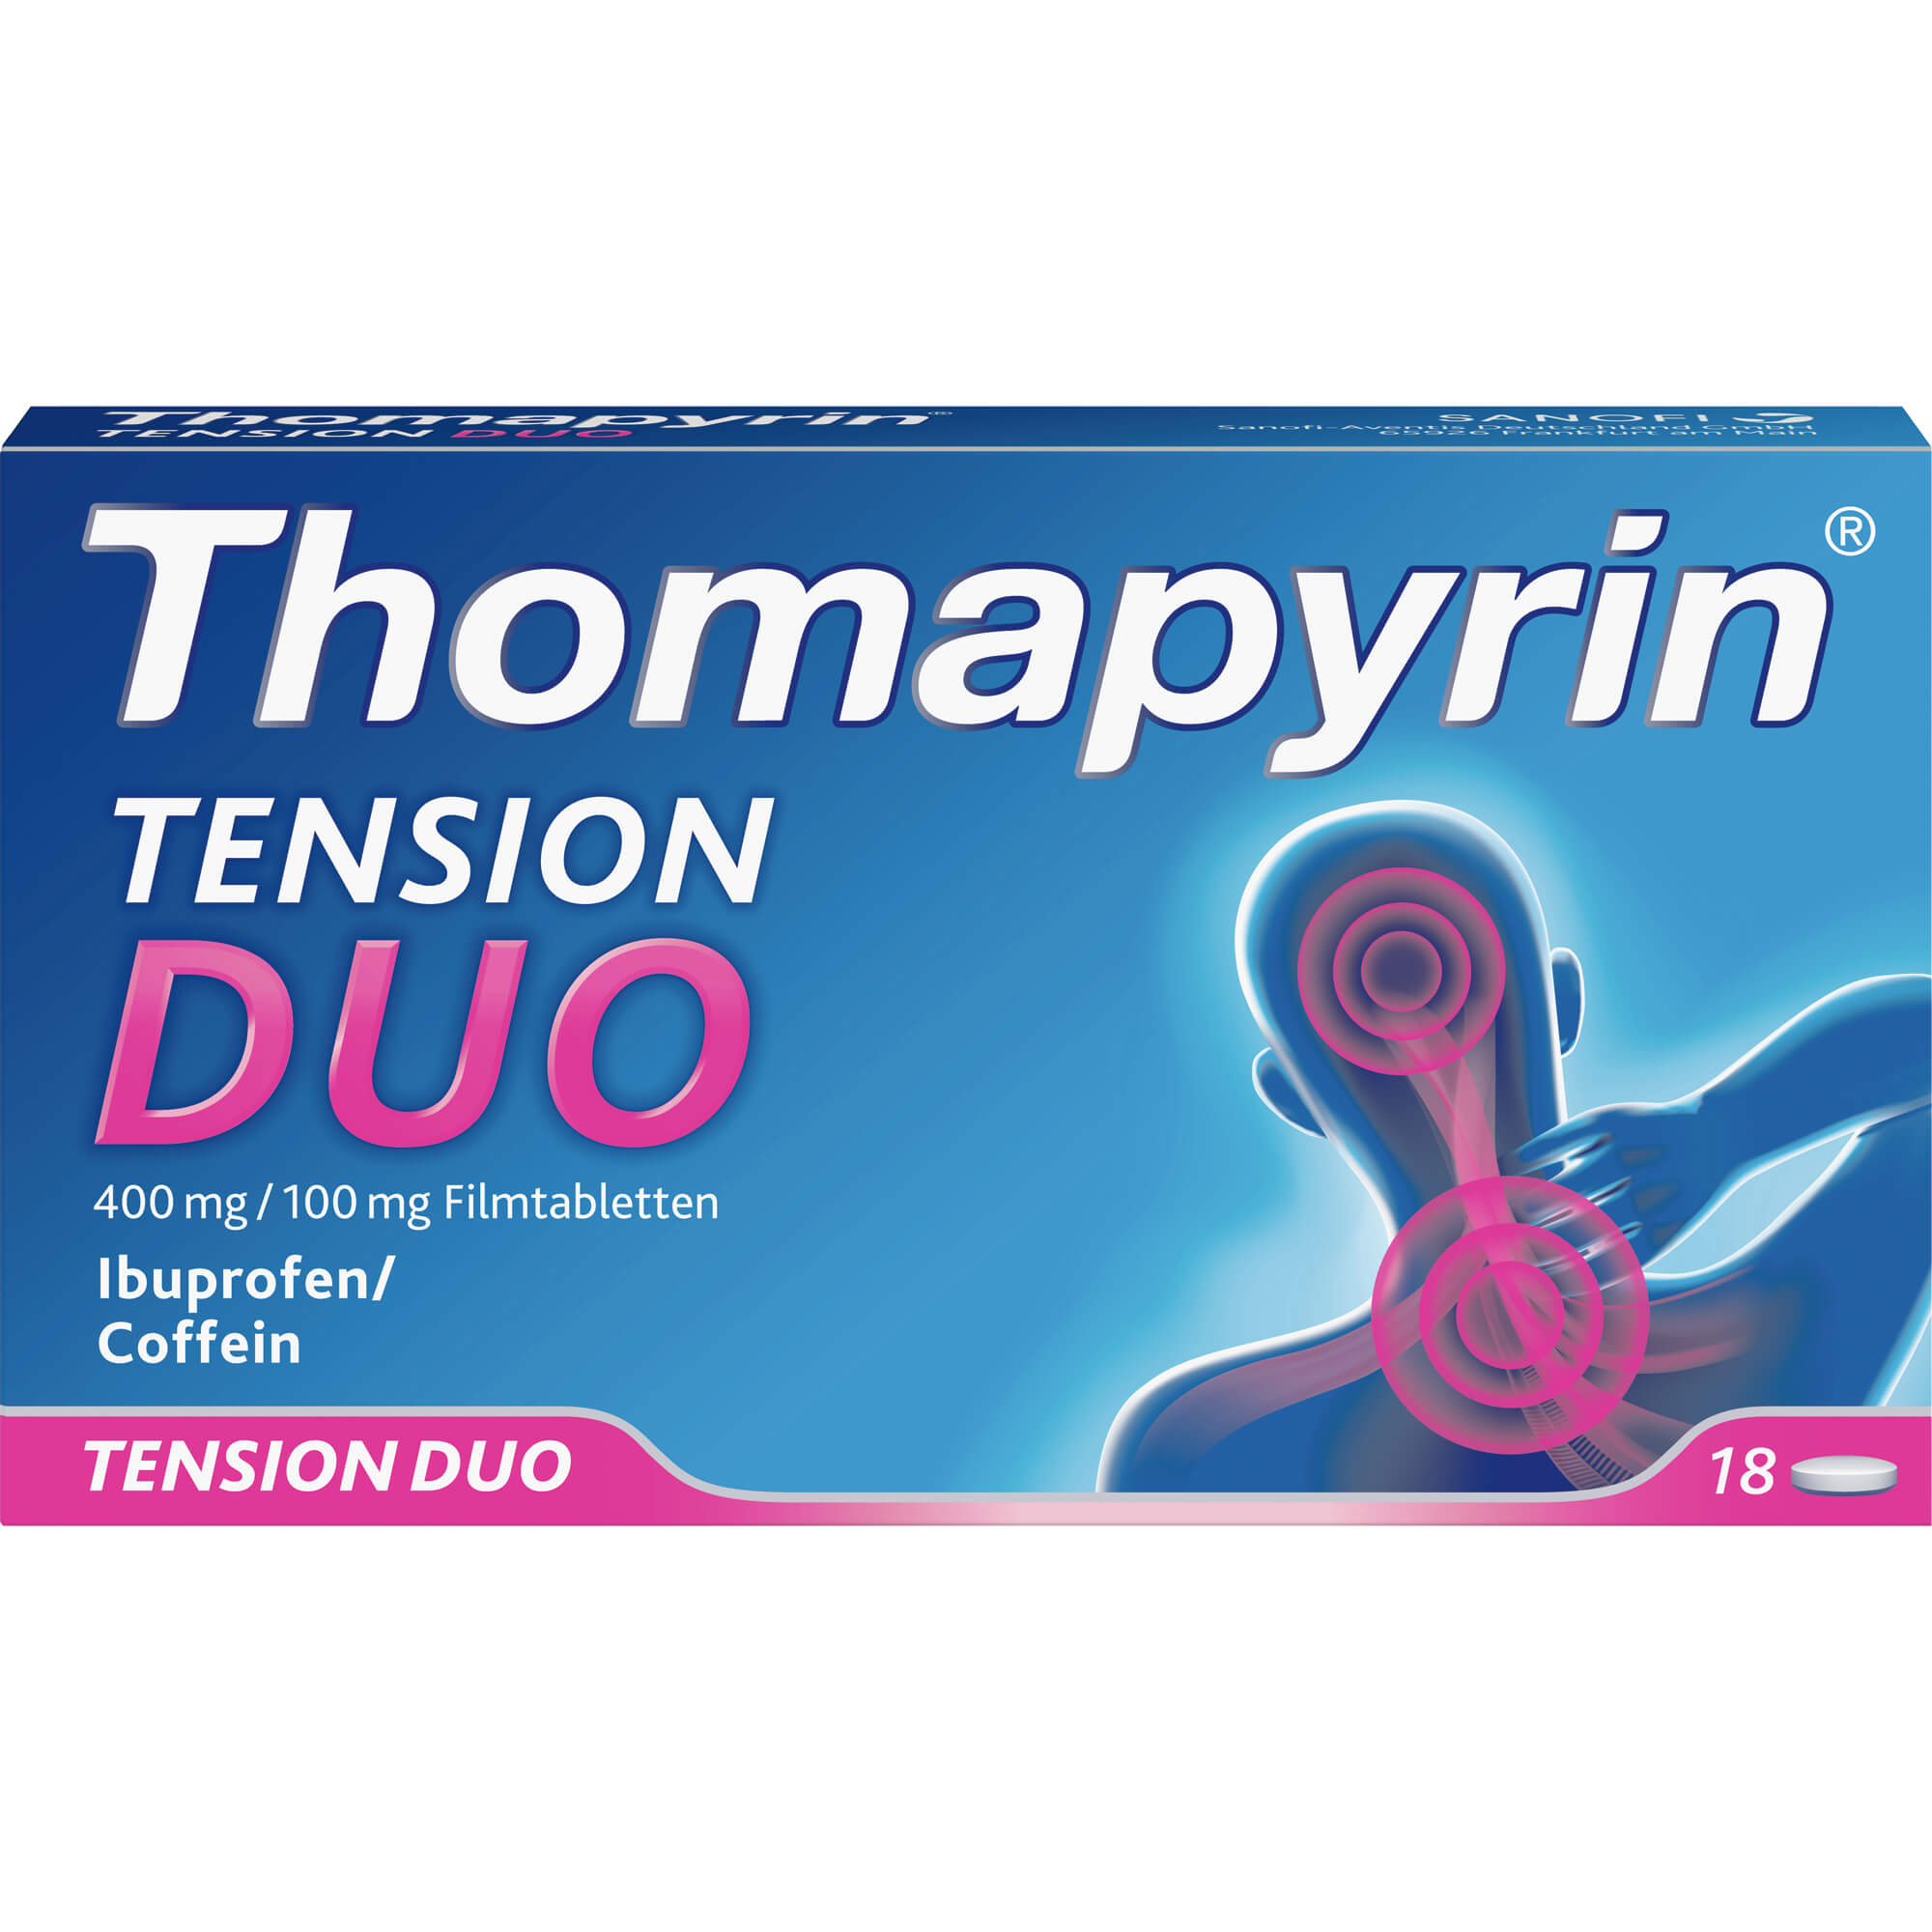 THOMAPYRIN-TENSION-DUO-400-mg-100-mg-Filmtabletten